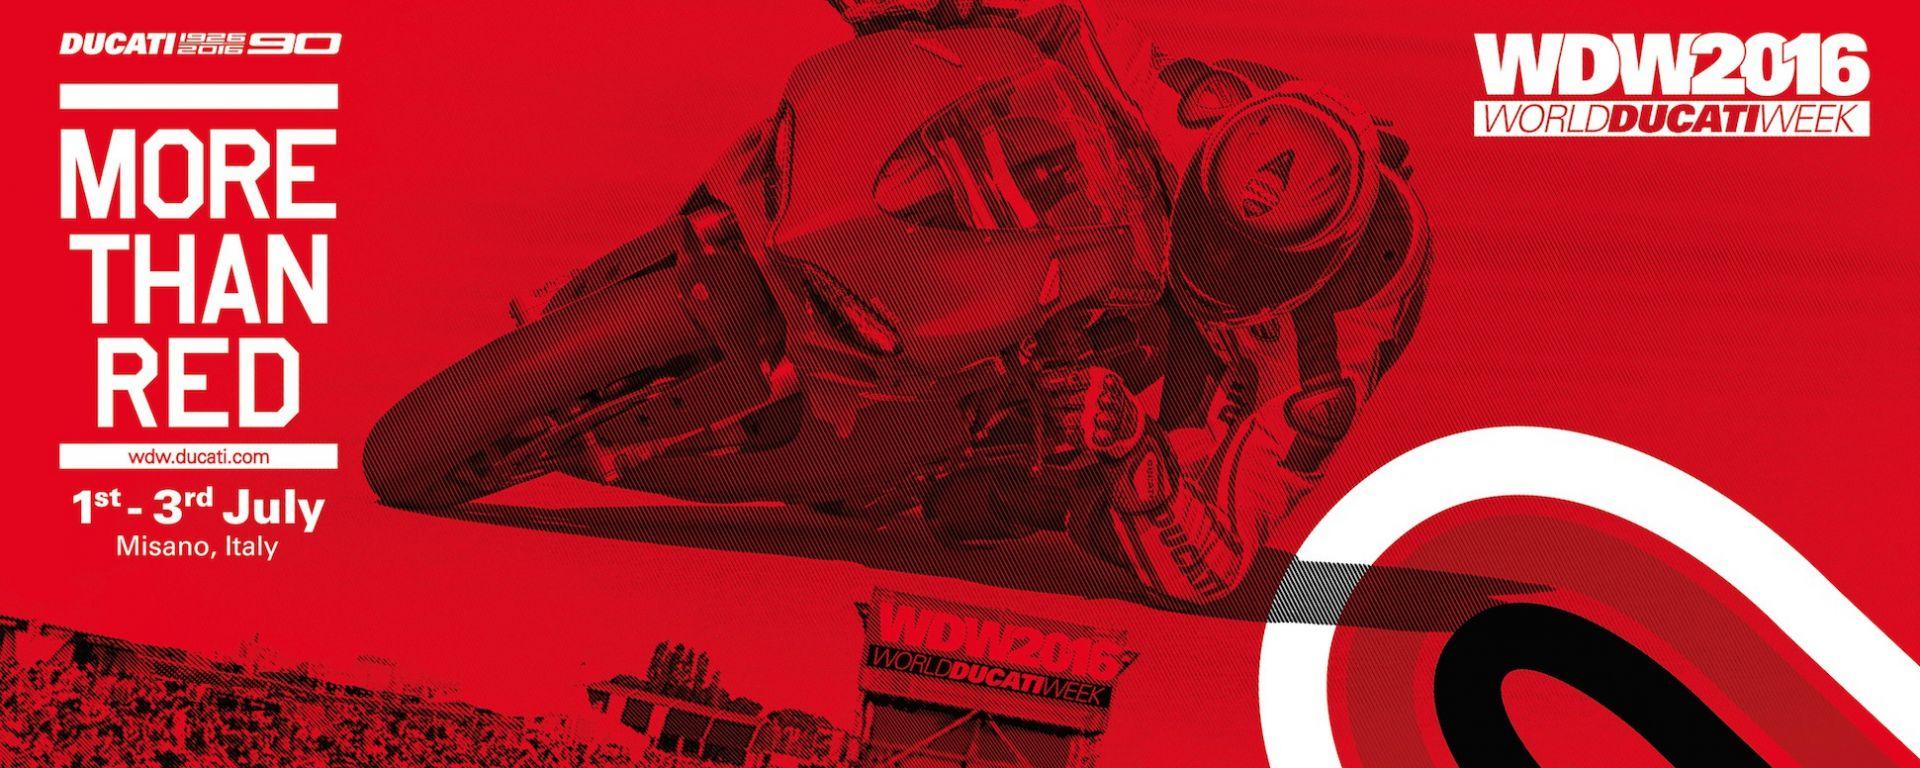 World Ducati Week 2016: dal 1 luglio si festeggia a Misano